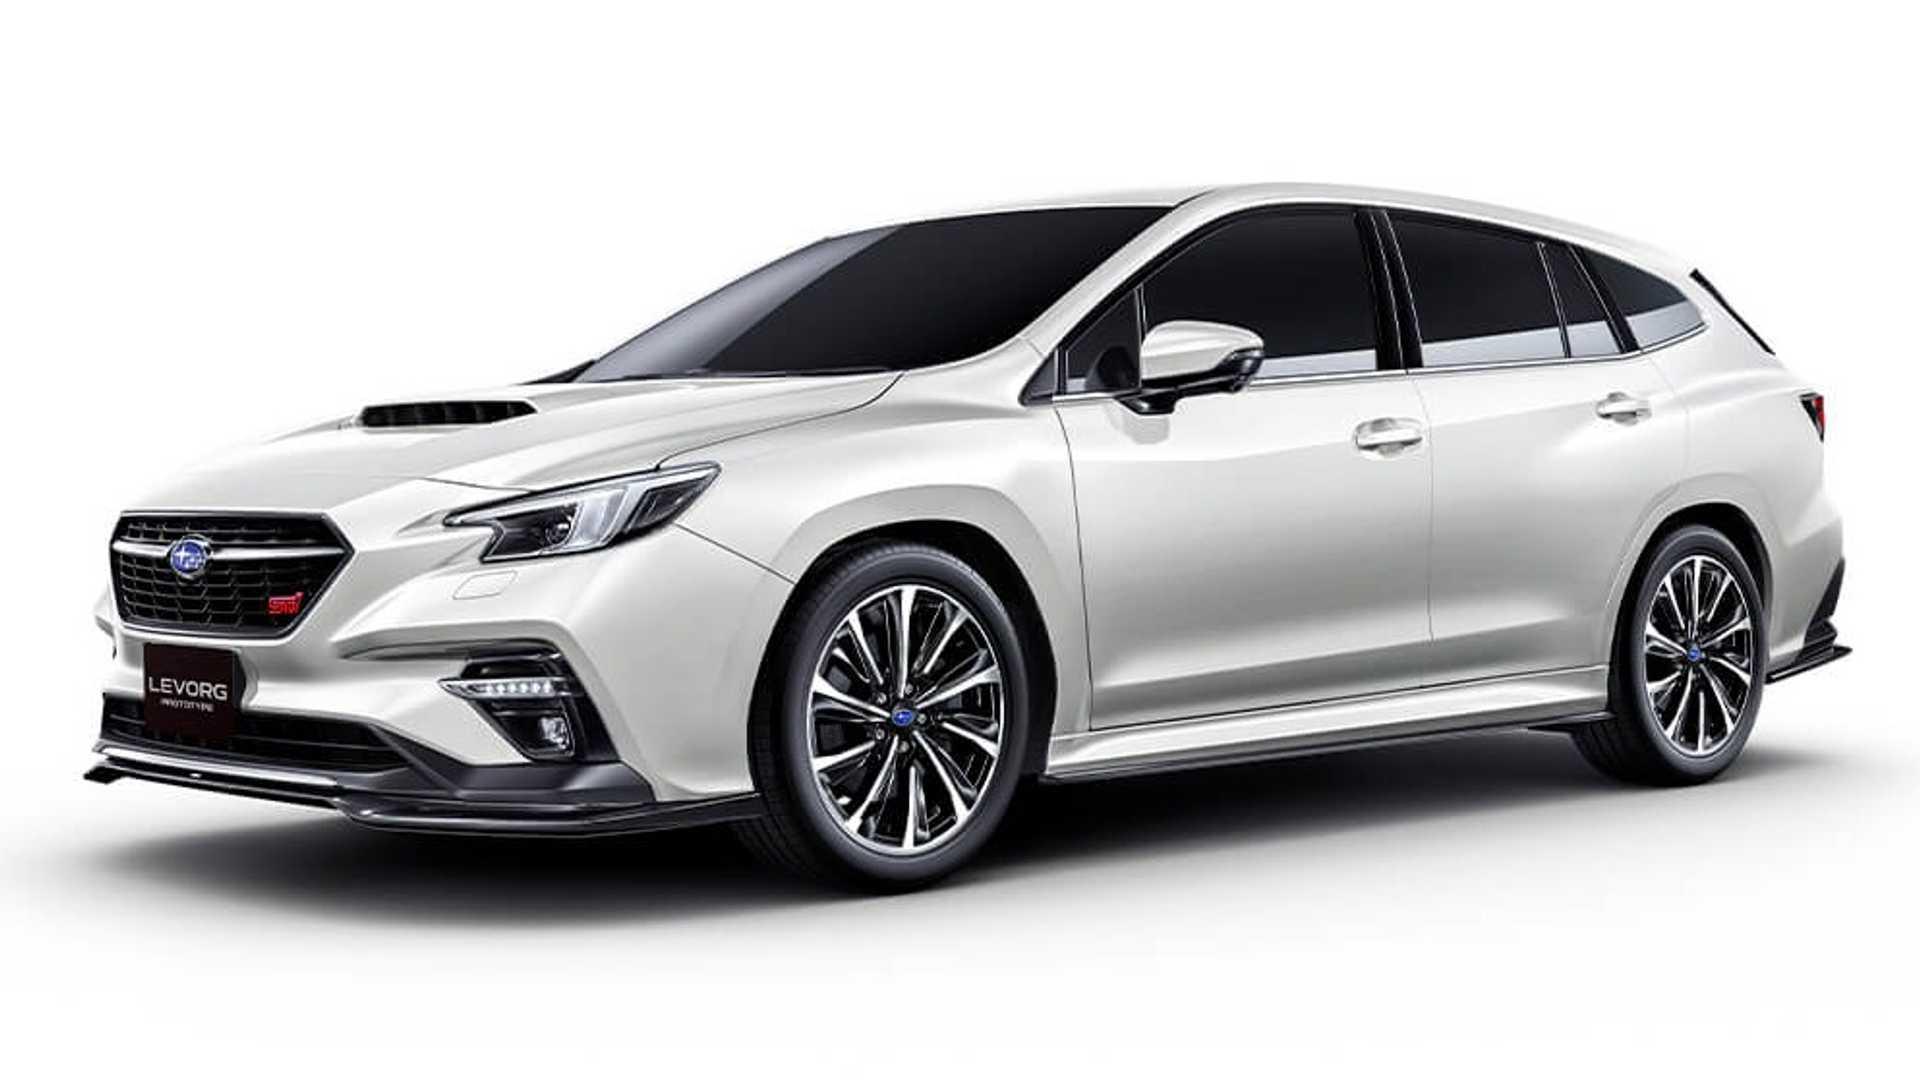 Subaru-Levorg-STI-Sport-Prototype-6